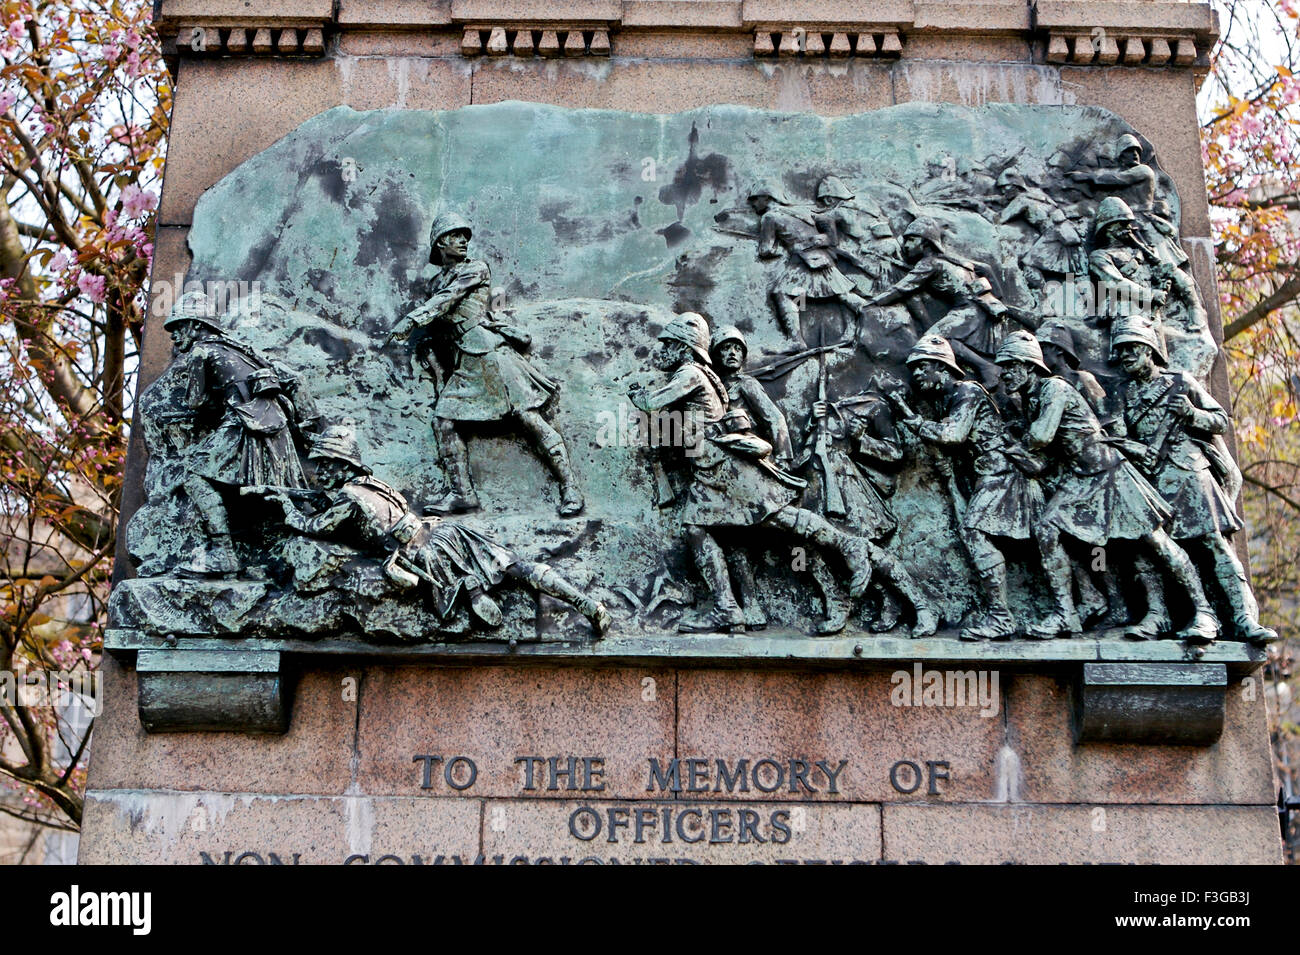 war scene depicted as a sculpture on a wall ; Edinburgh Castle ; Scotland ; U.K. United Kingdom England - Stock Image